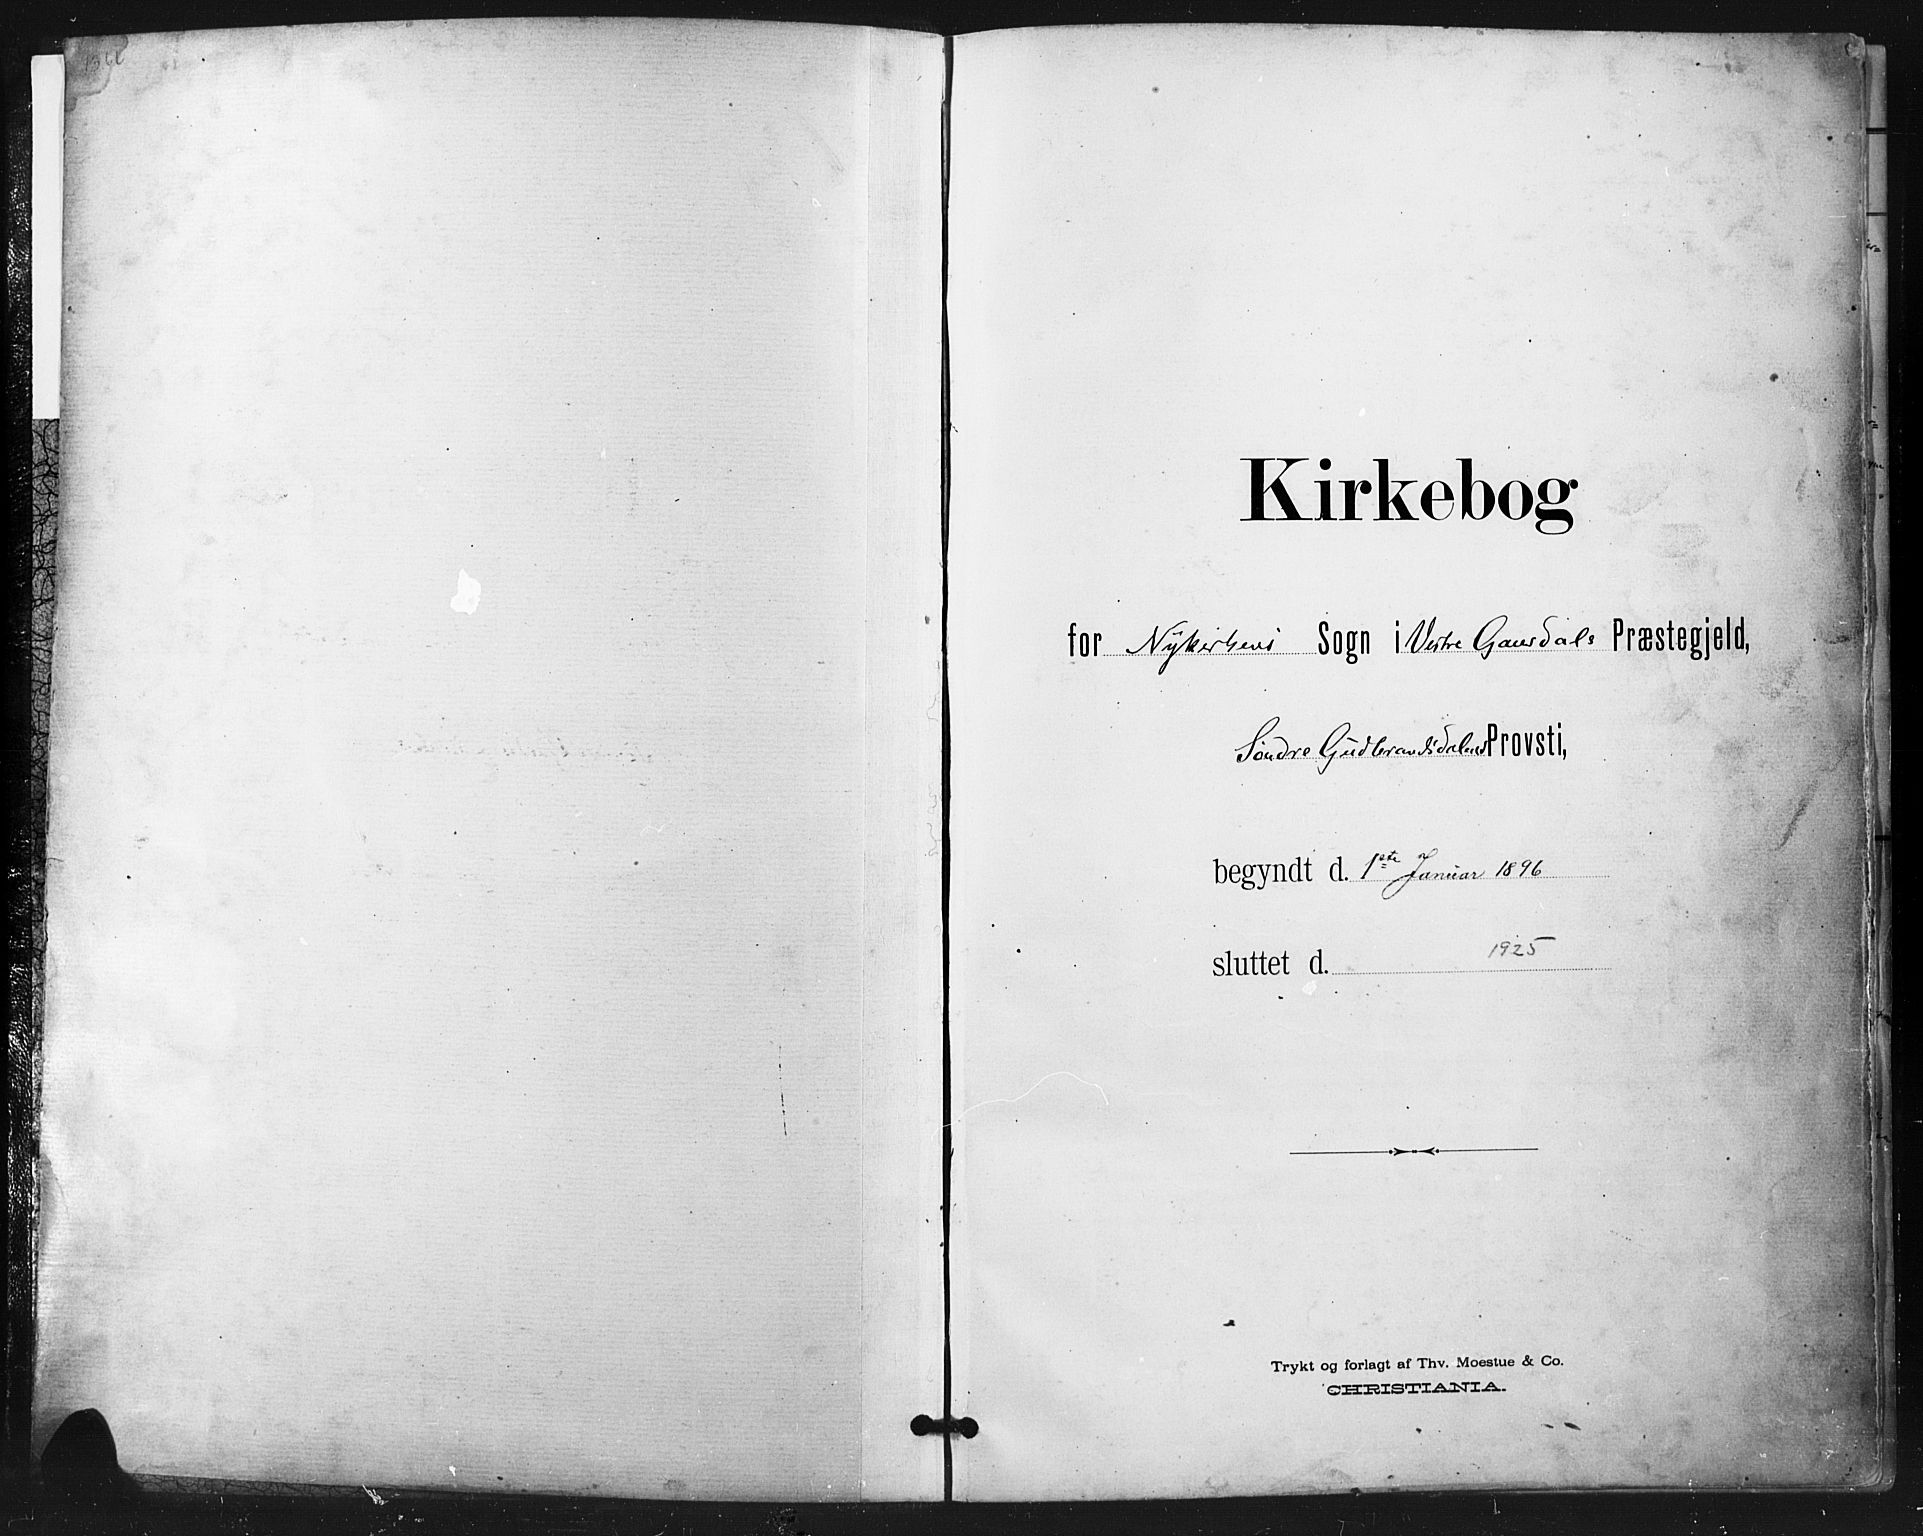 SAH, Vestre Gausdal prestekontor, Klokkerbok nr. 3, 1896-1925